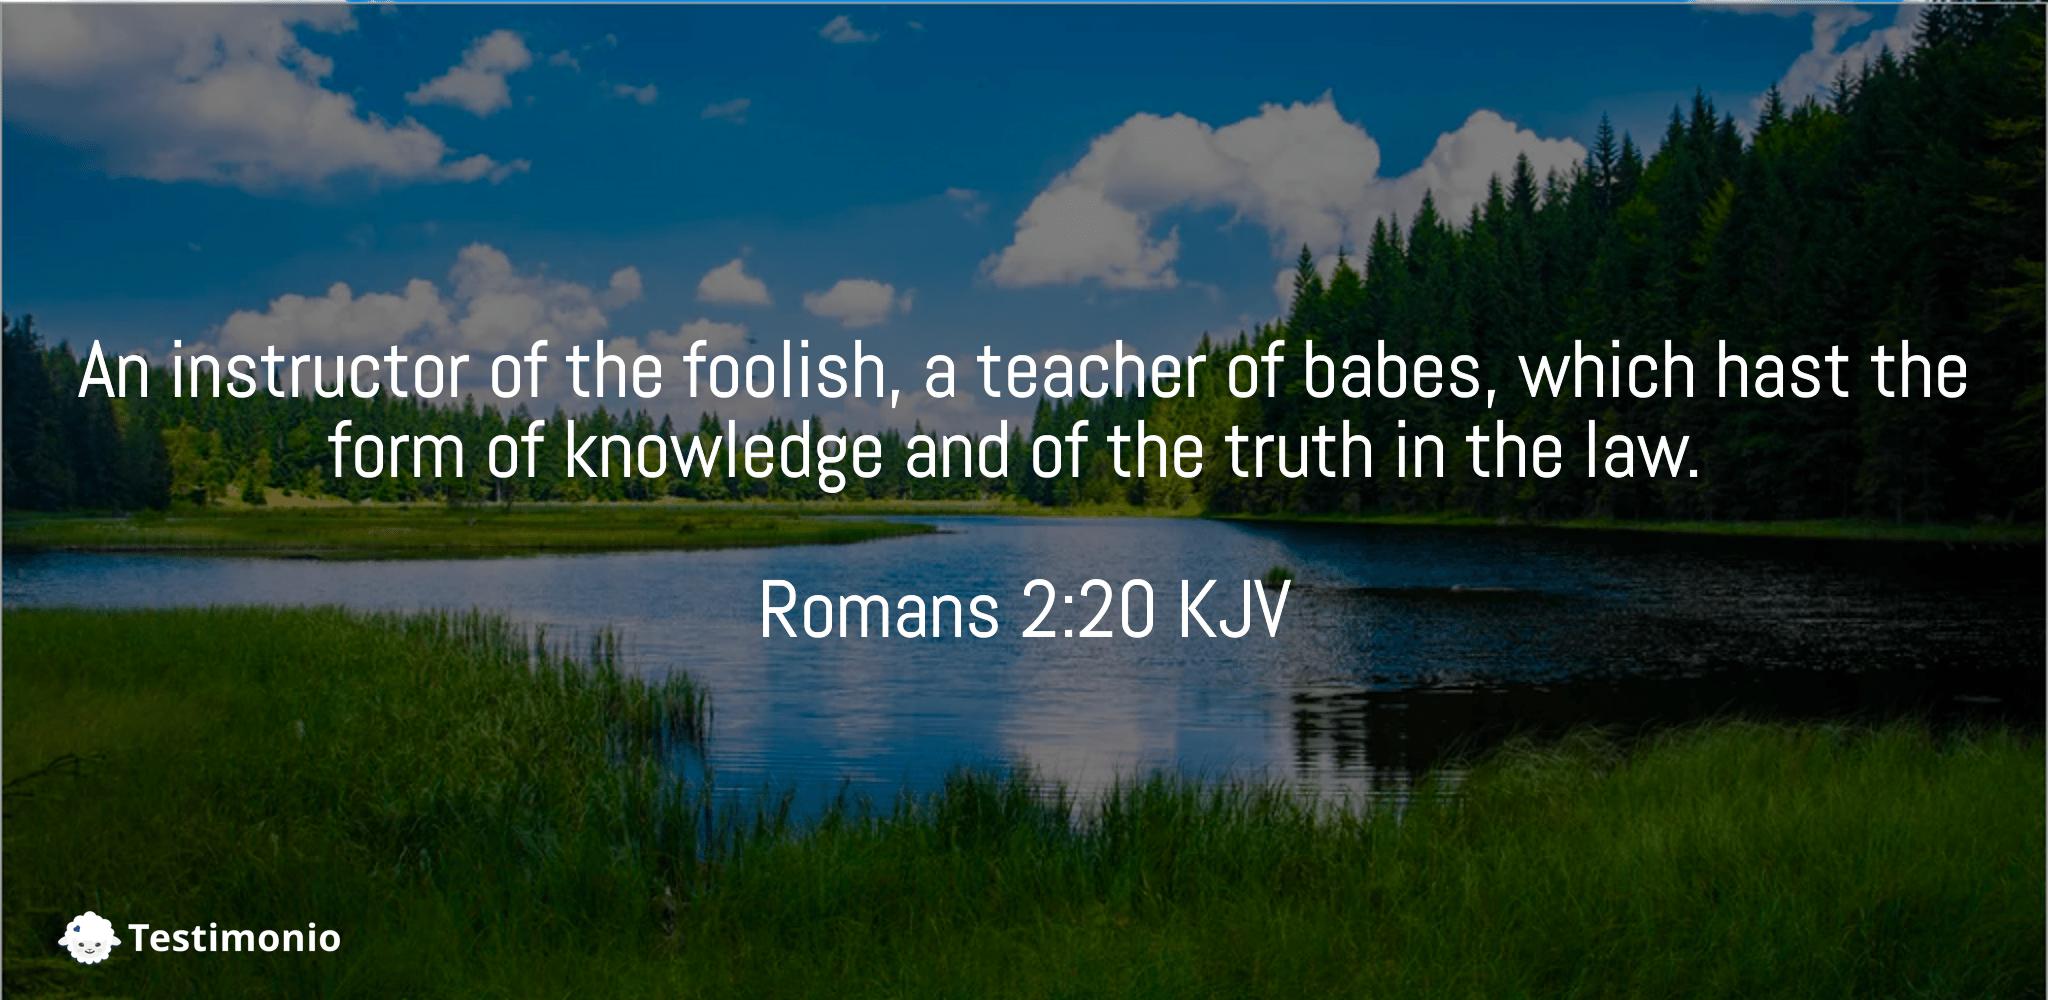 Romans 2:20